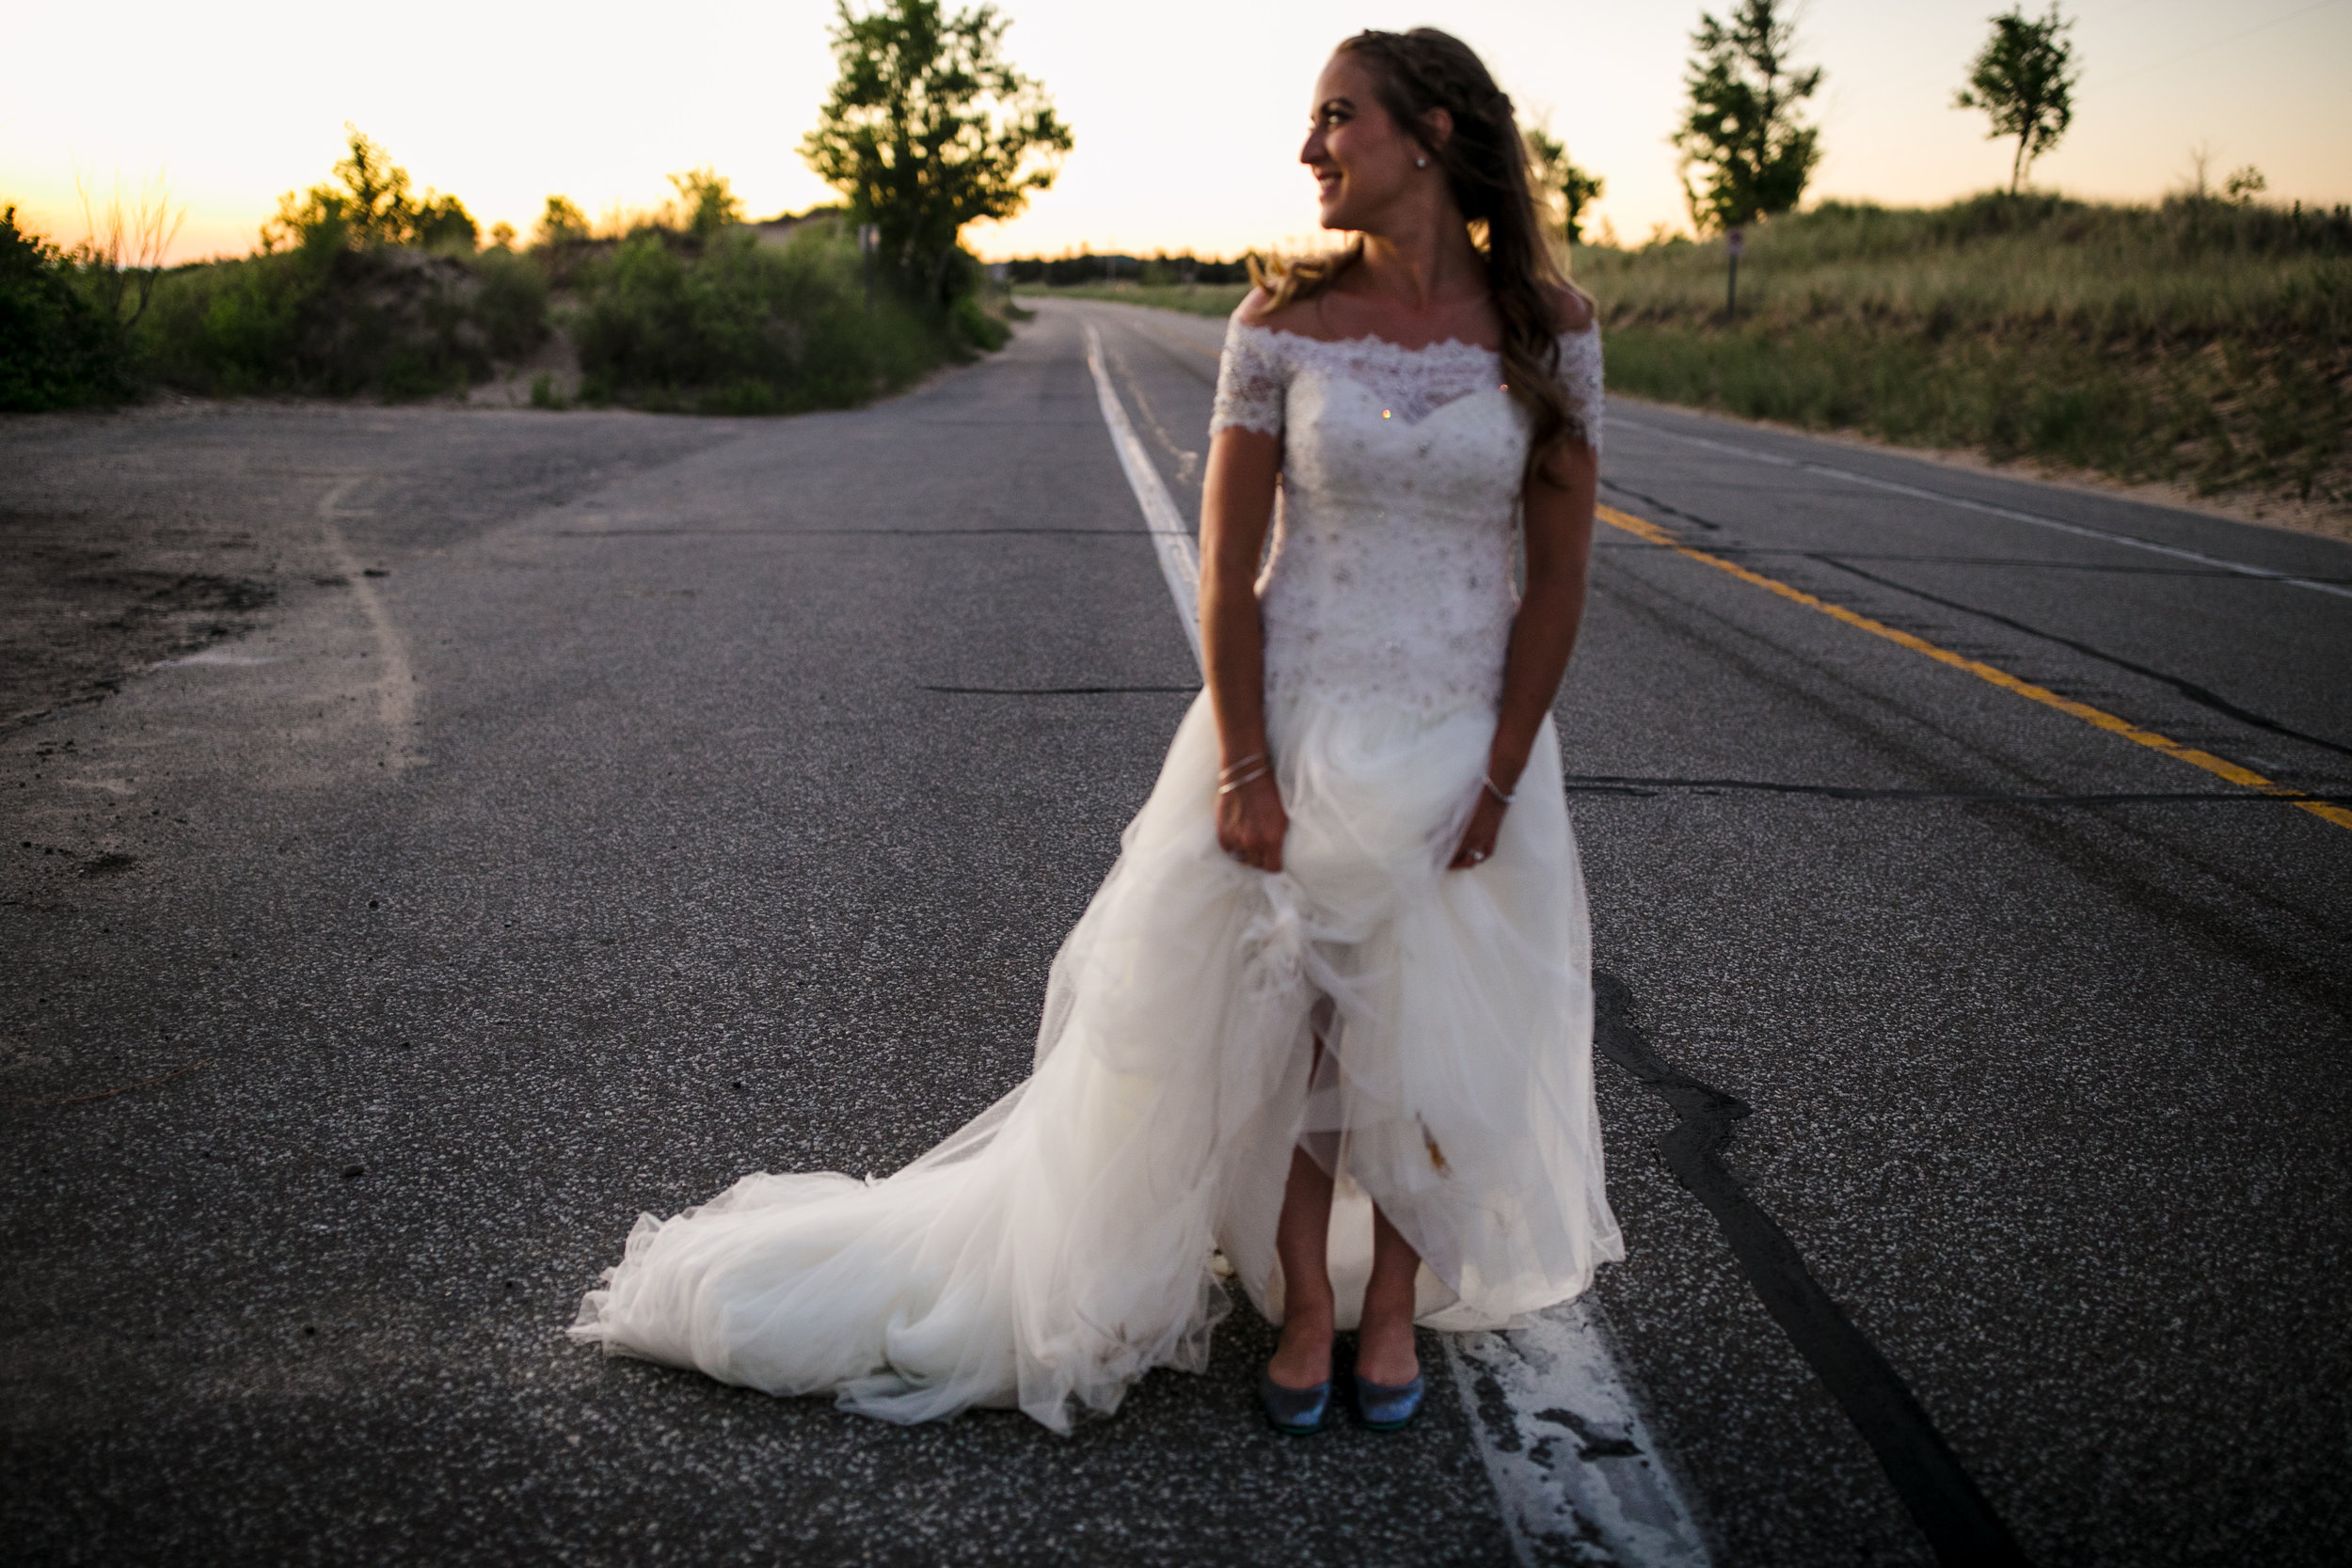 ludington-michigan-intimate-backyard-wedding-jessica-nolan516.jpg